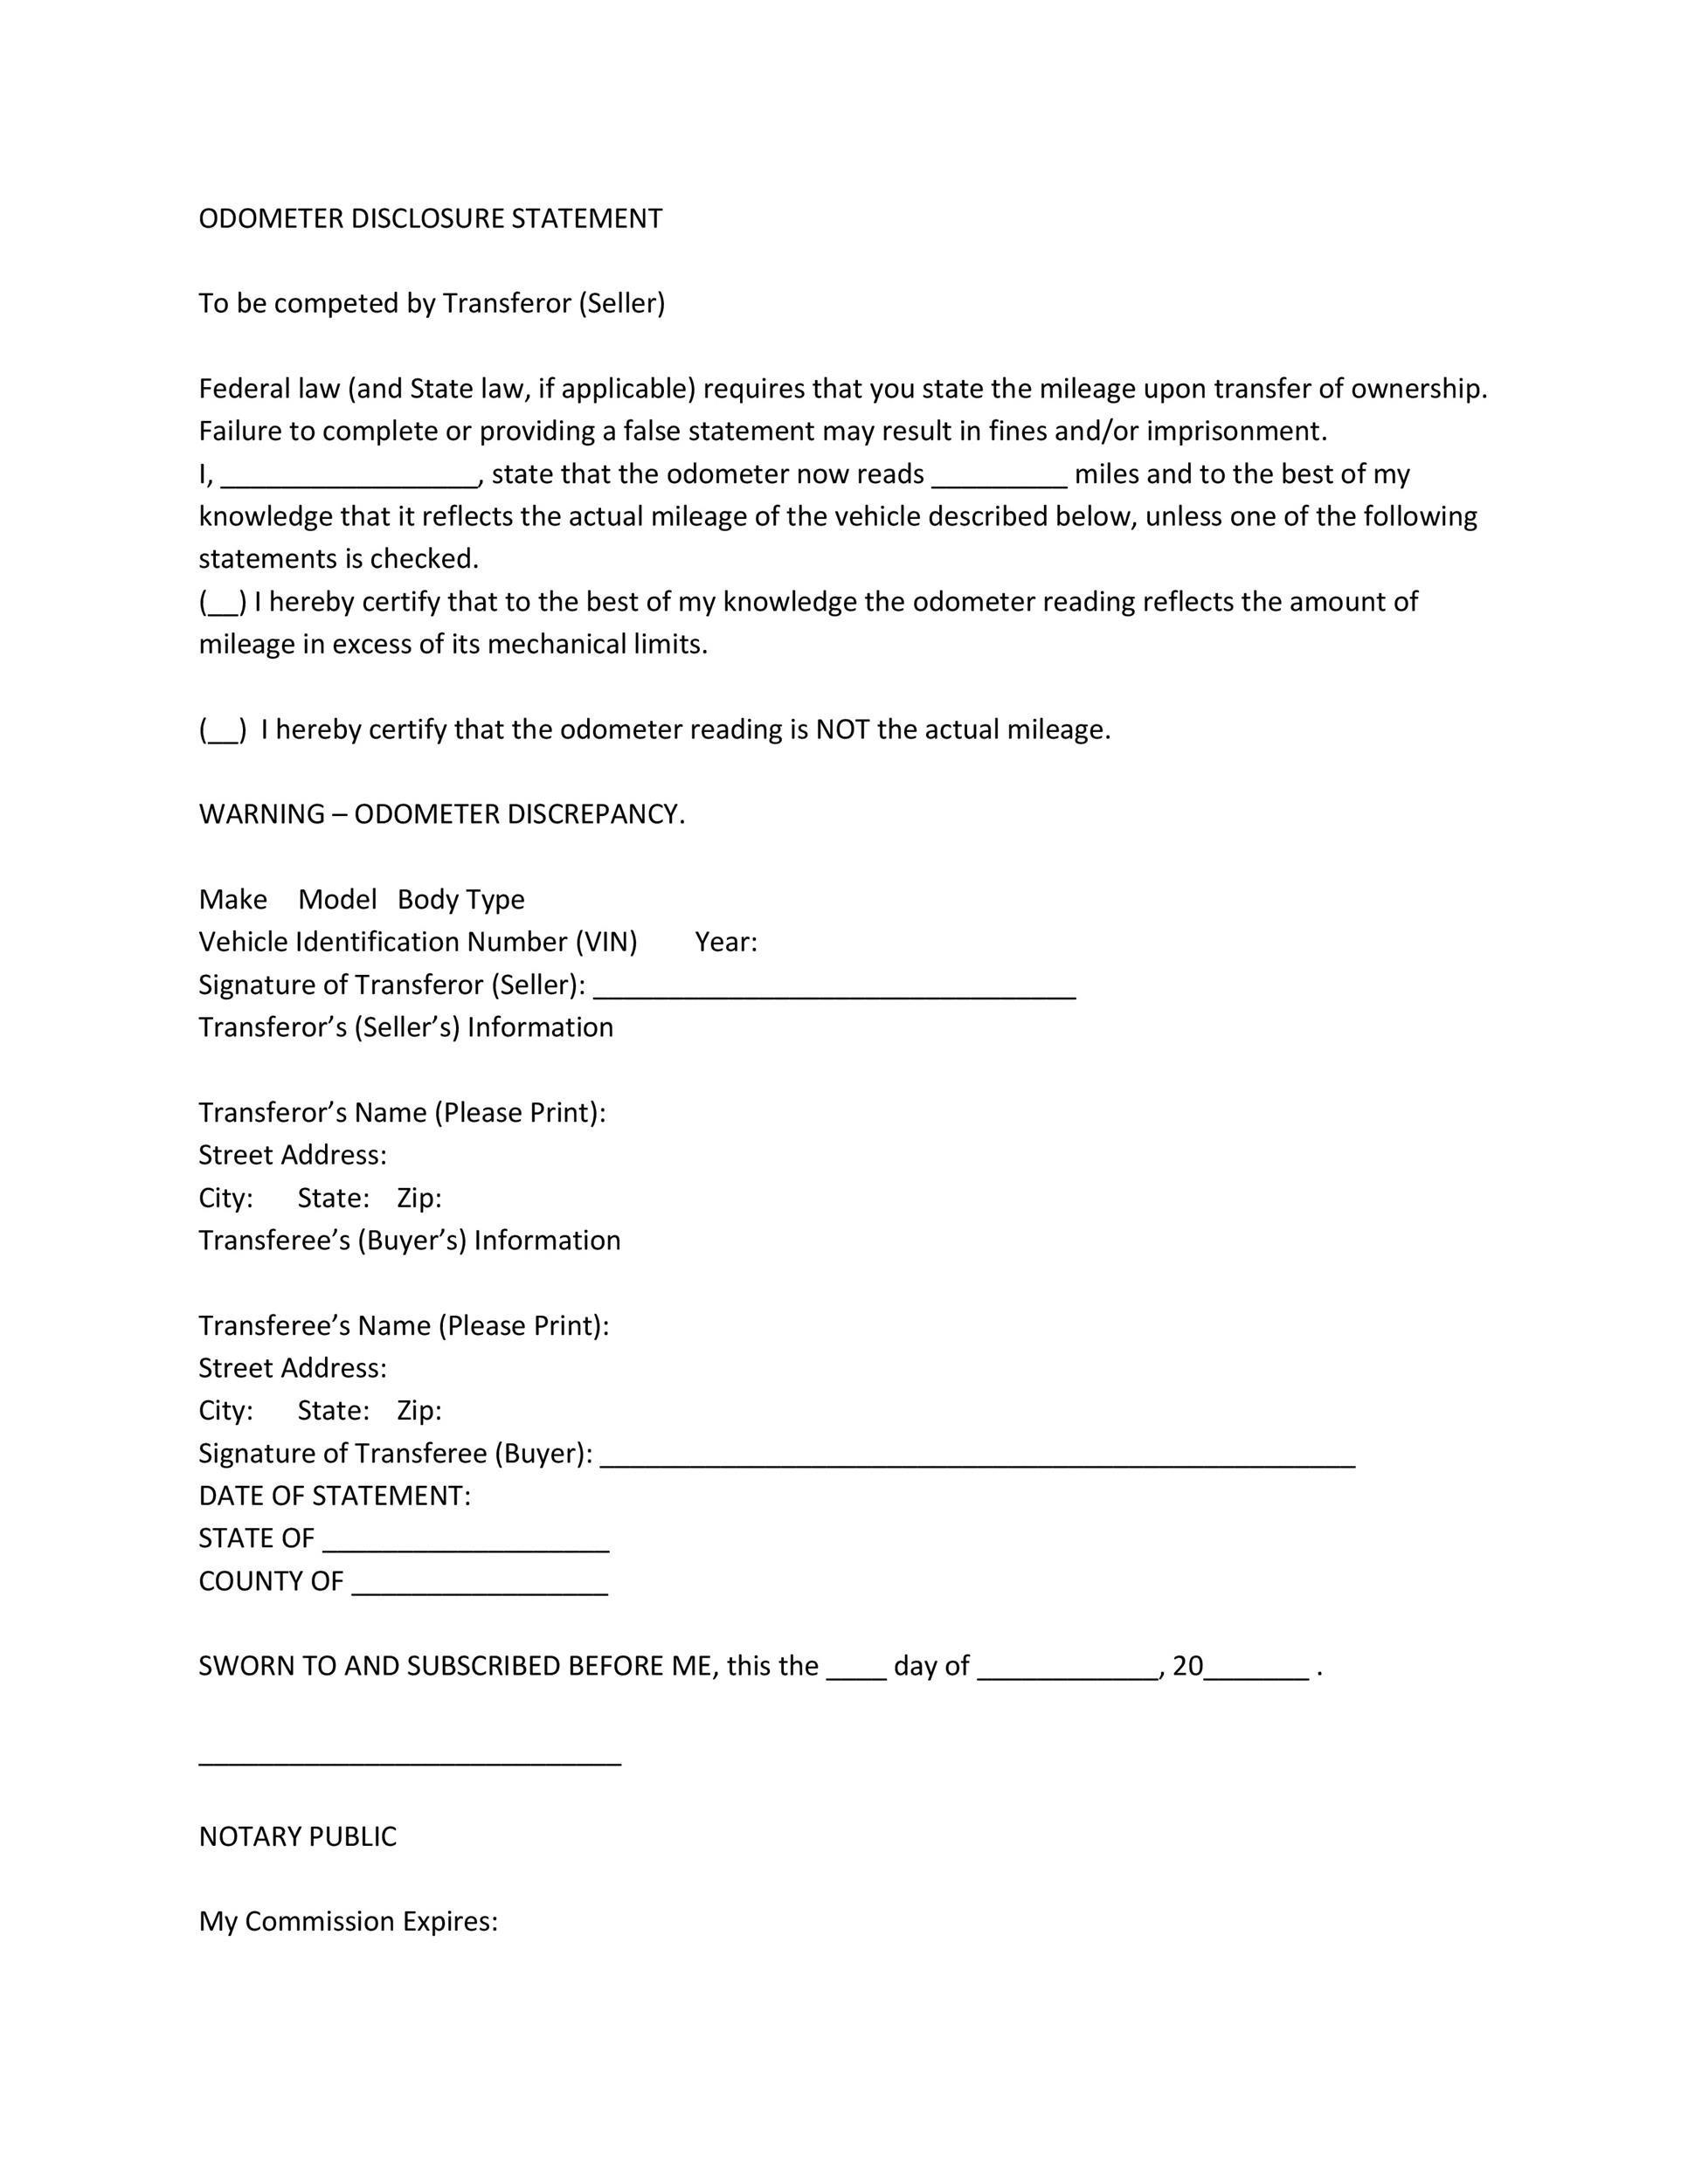 Free odometer disclosure statement 45